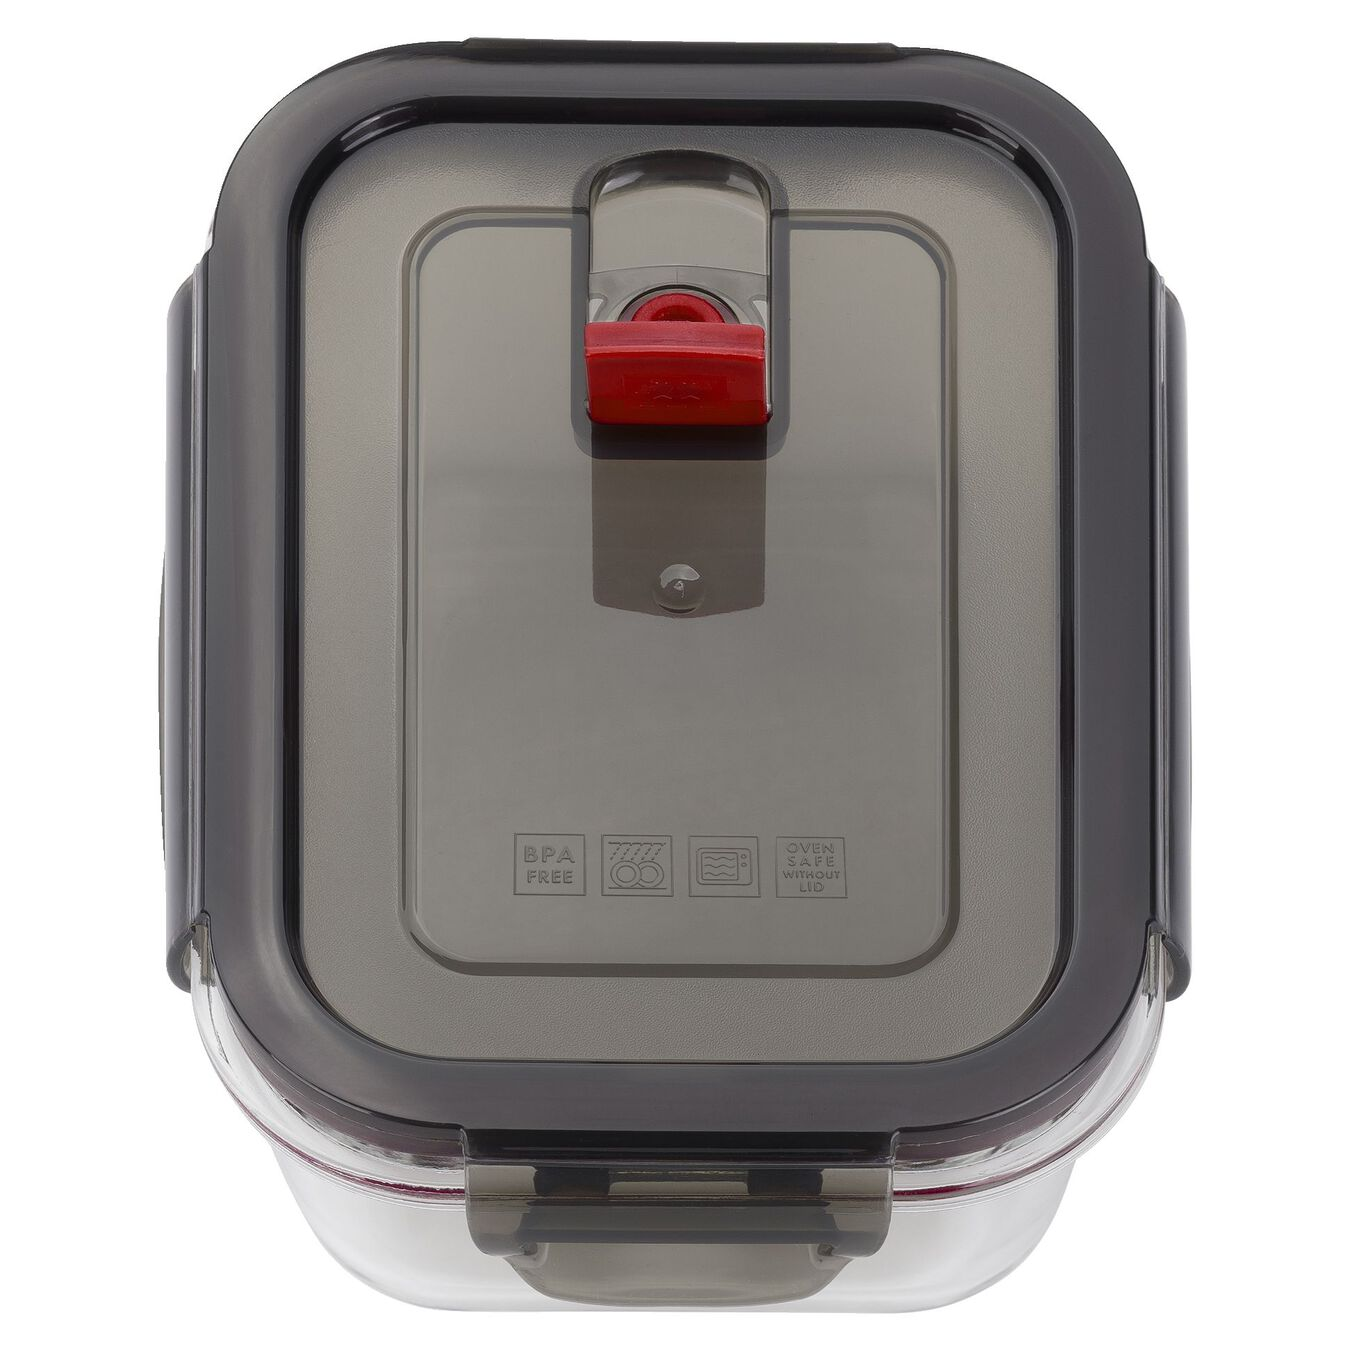 600 ml Borosilicate glass Glass Storage Container, Rectangular,,large 3